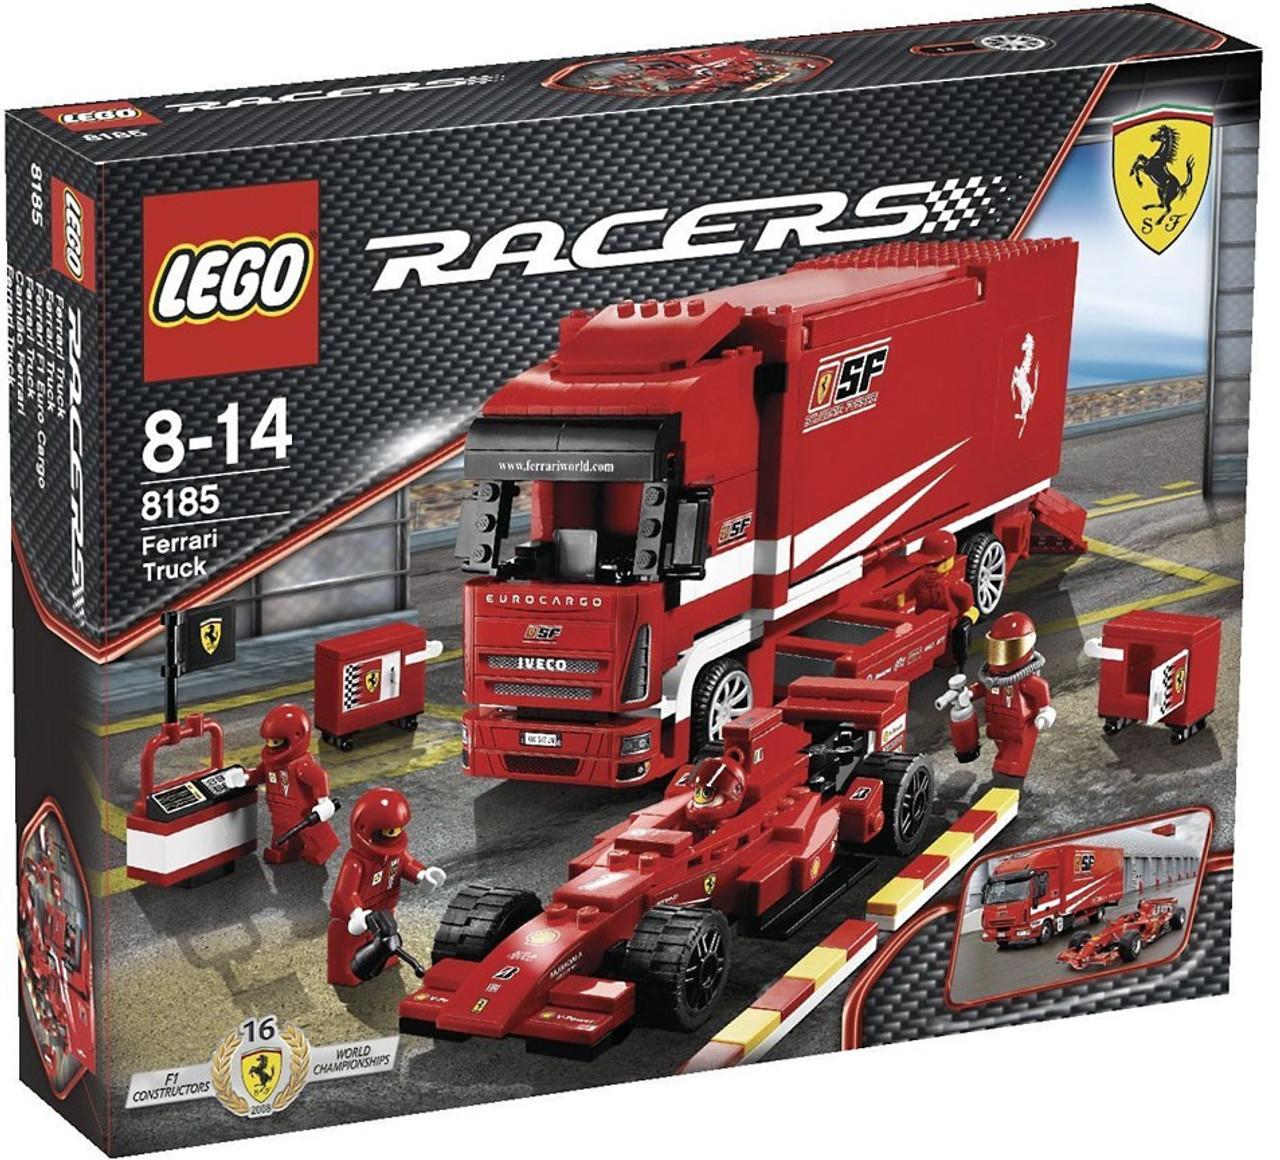 LEGO Racers Ferrari Truck Set 8185 - ToyWiz